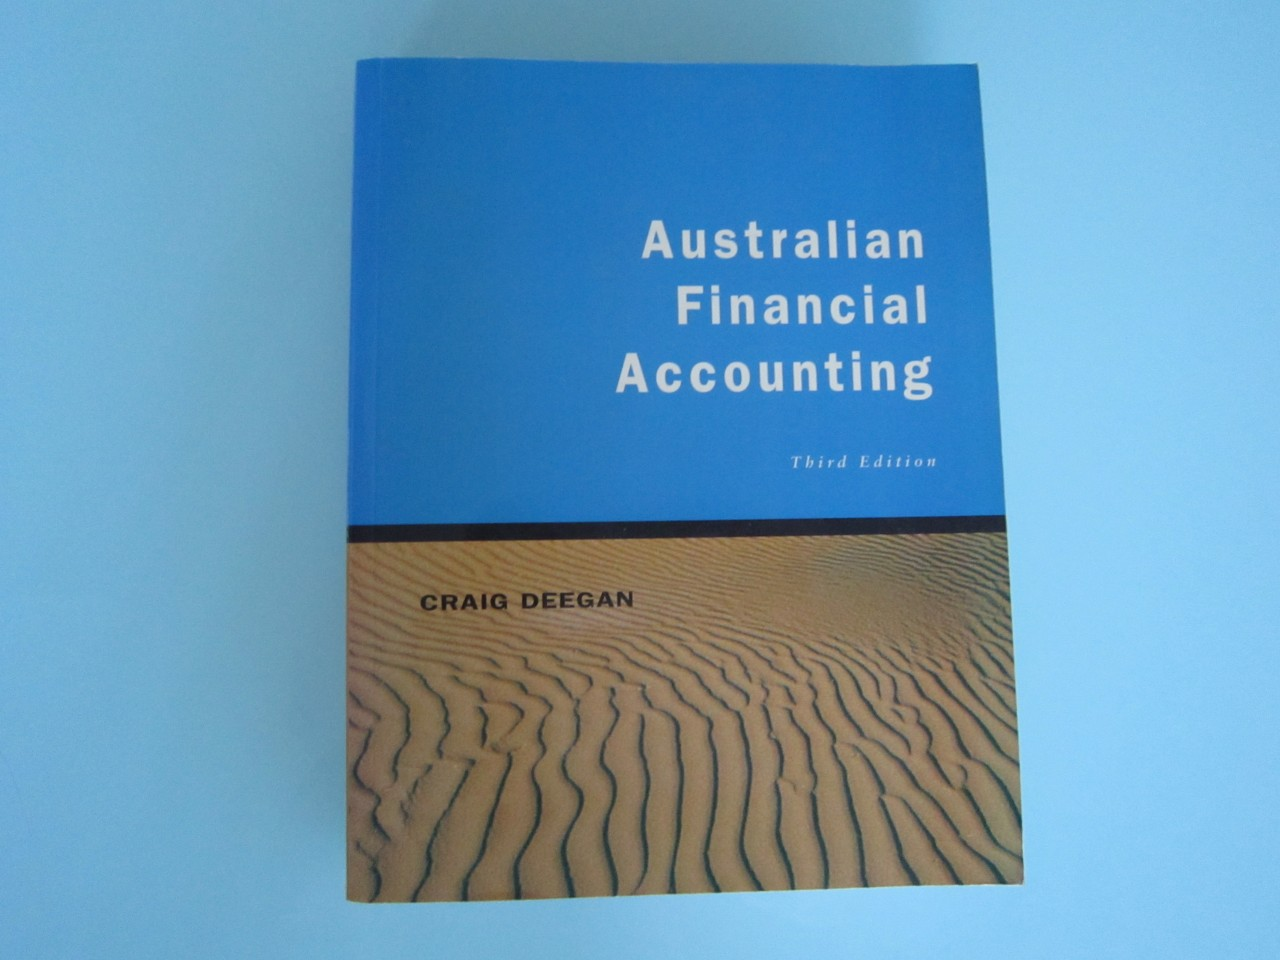 australian financial accounting third edition graig deegan. Black Bedroom Furniture Sets. Home Design Ideas